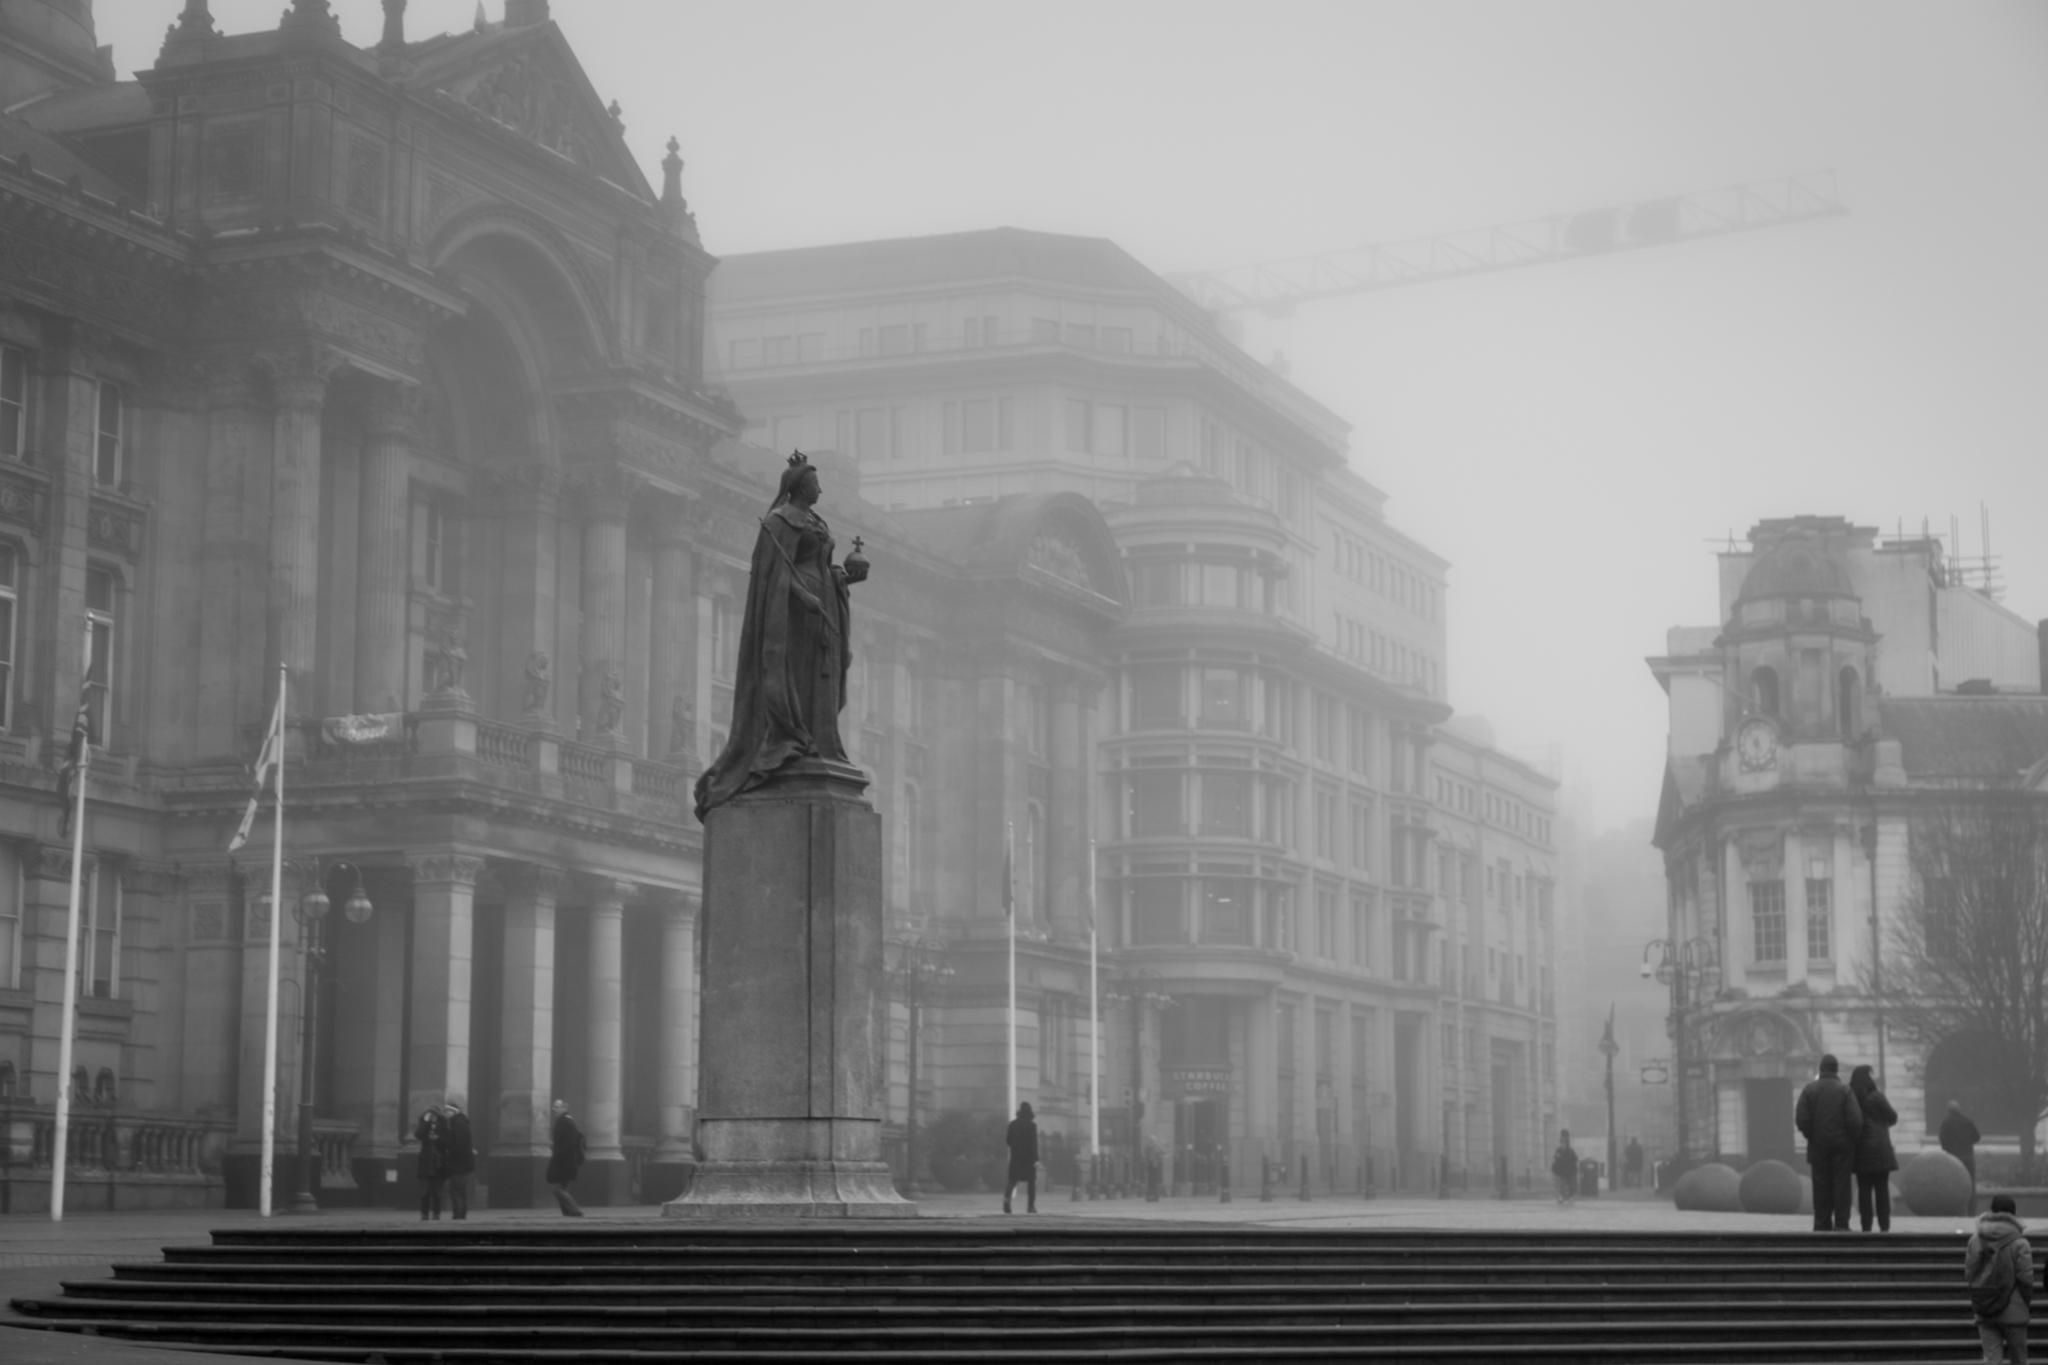 Victoria emerging from the fog in Victoria Square, Birmingham